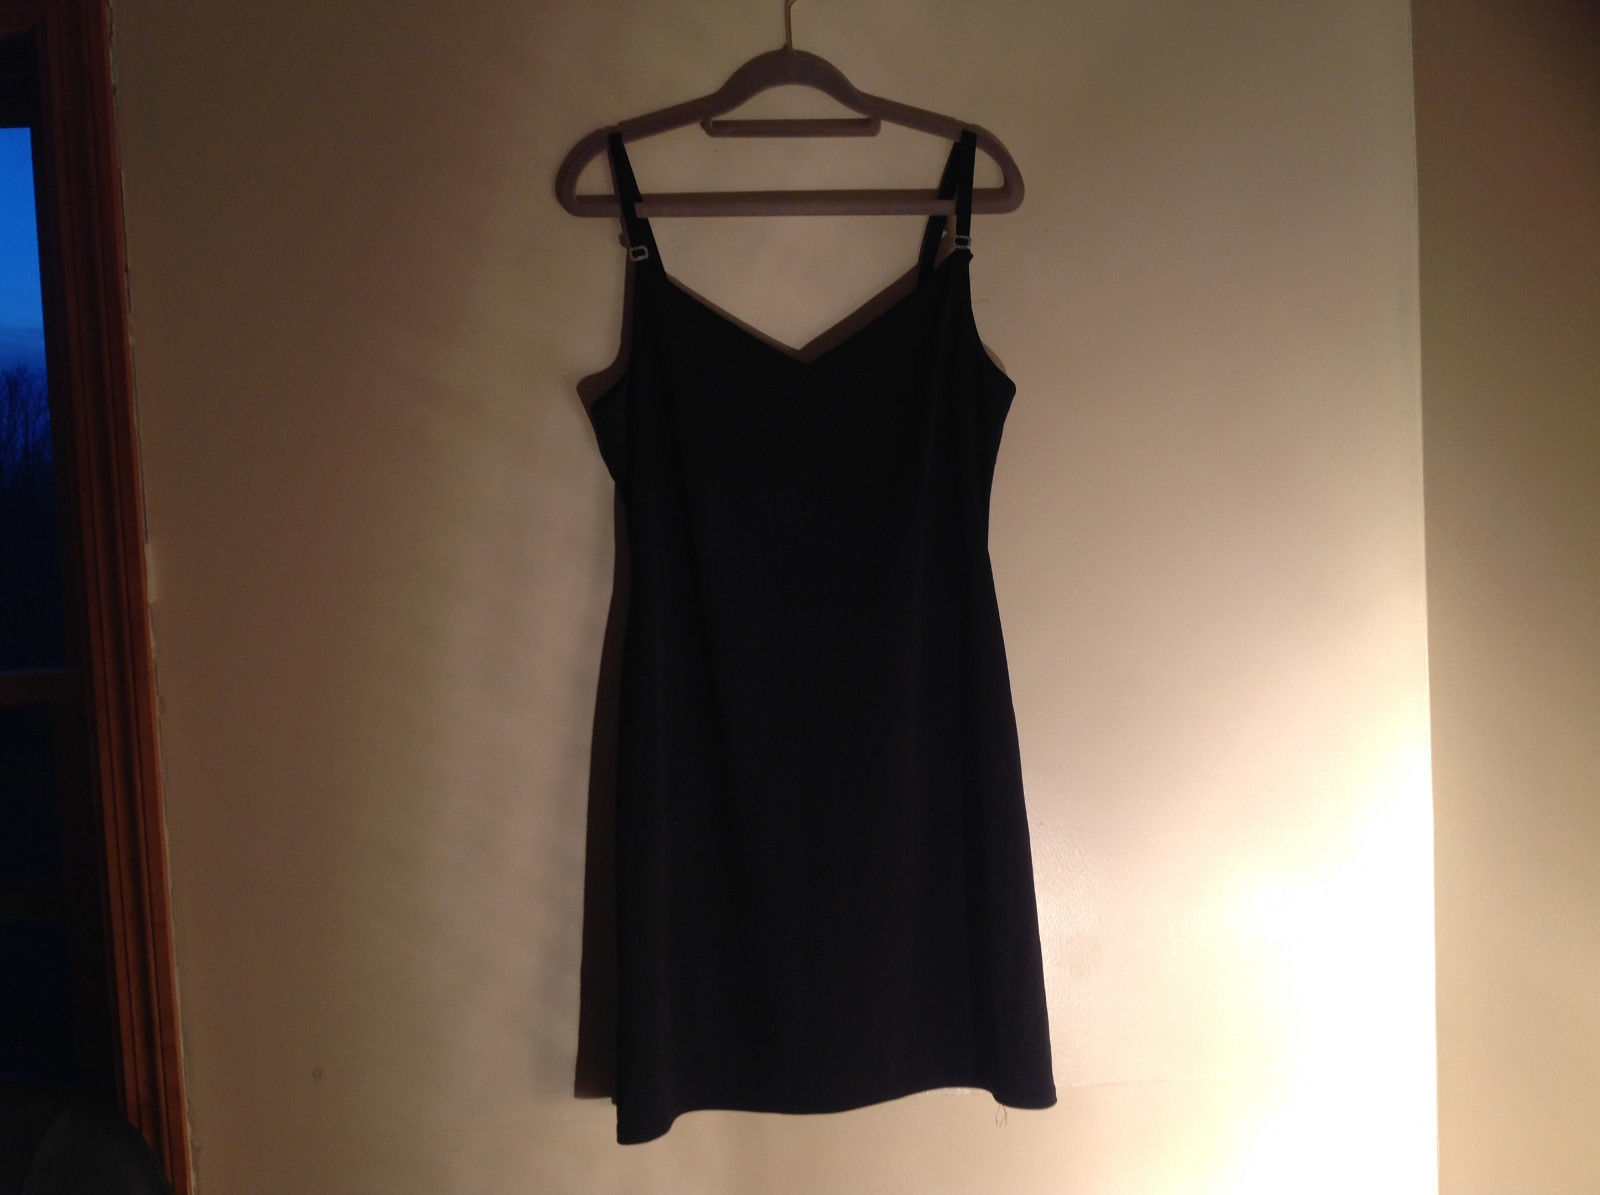 Little Black Dress Sweetheart Neckline Rhinestone Design Straps No Tag Size M